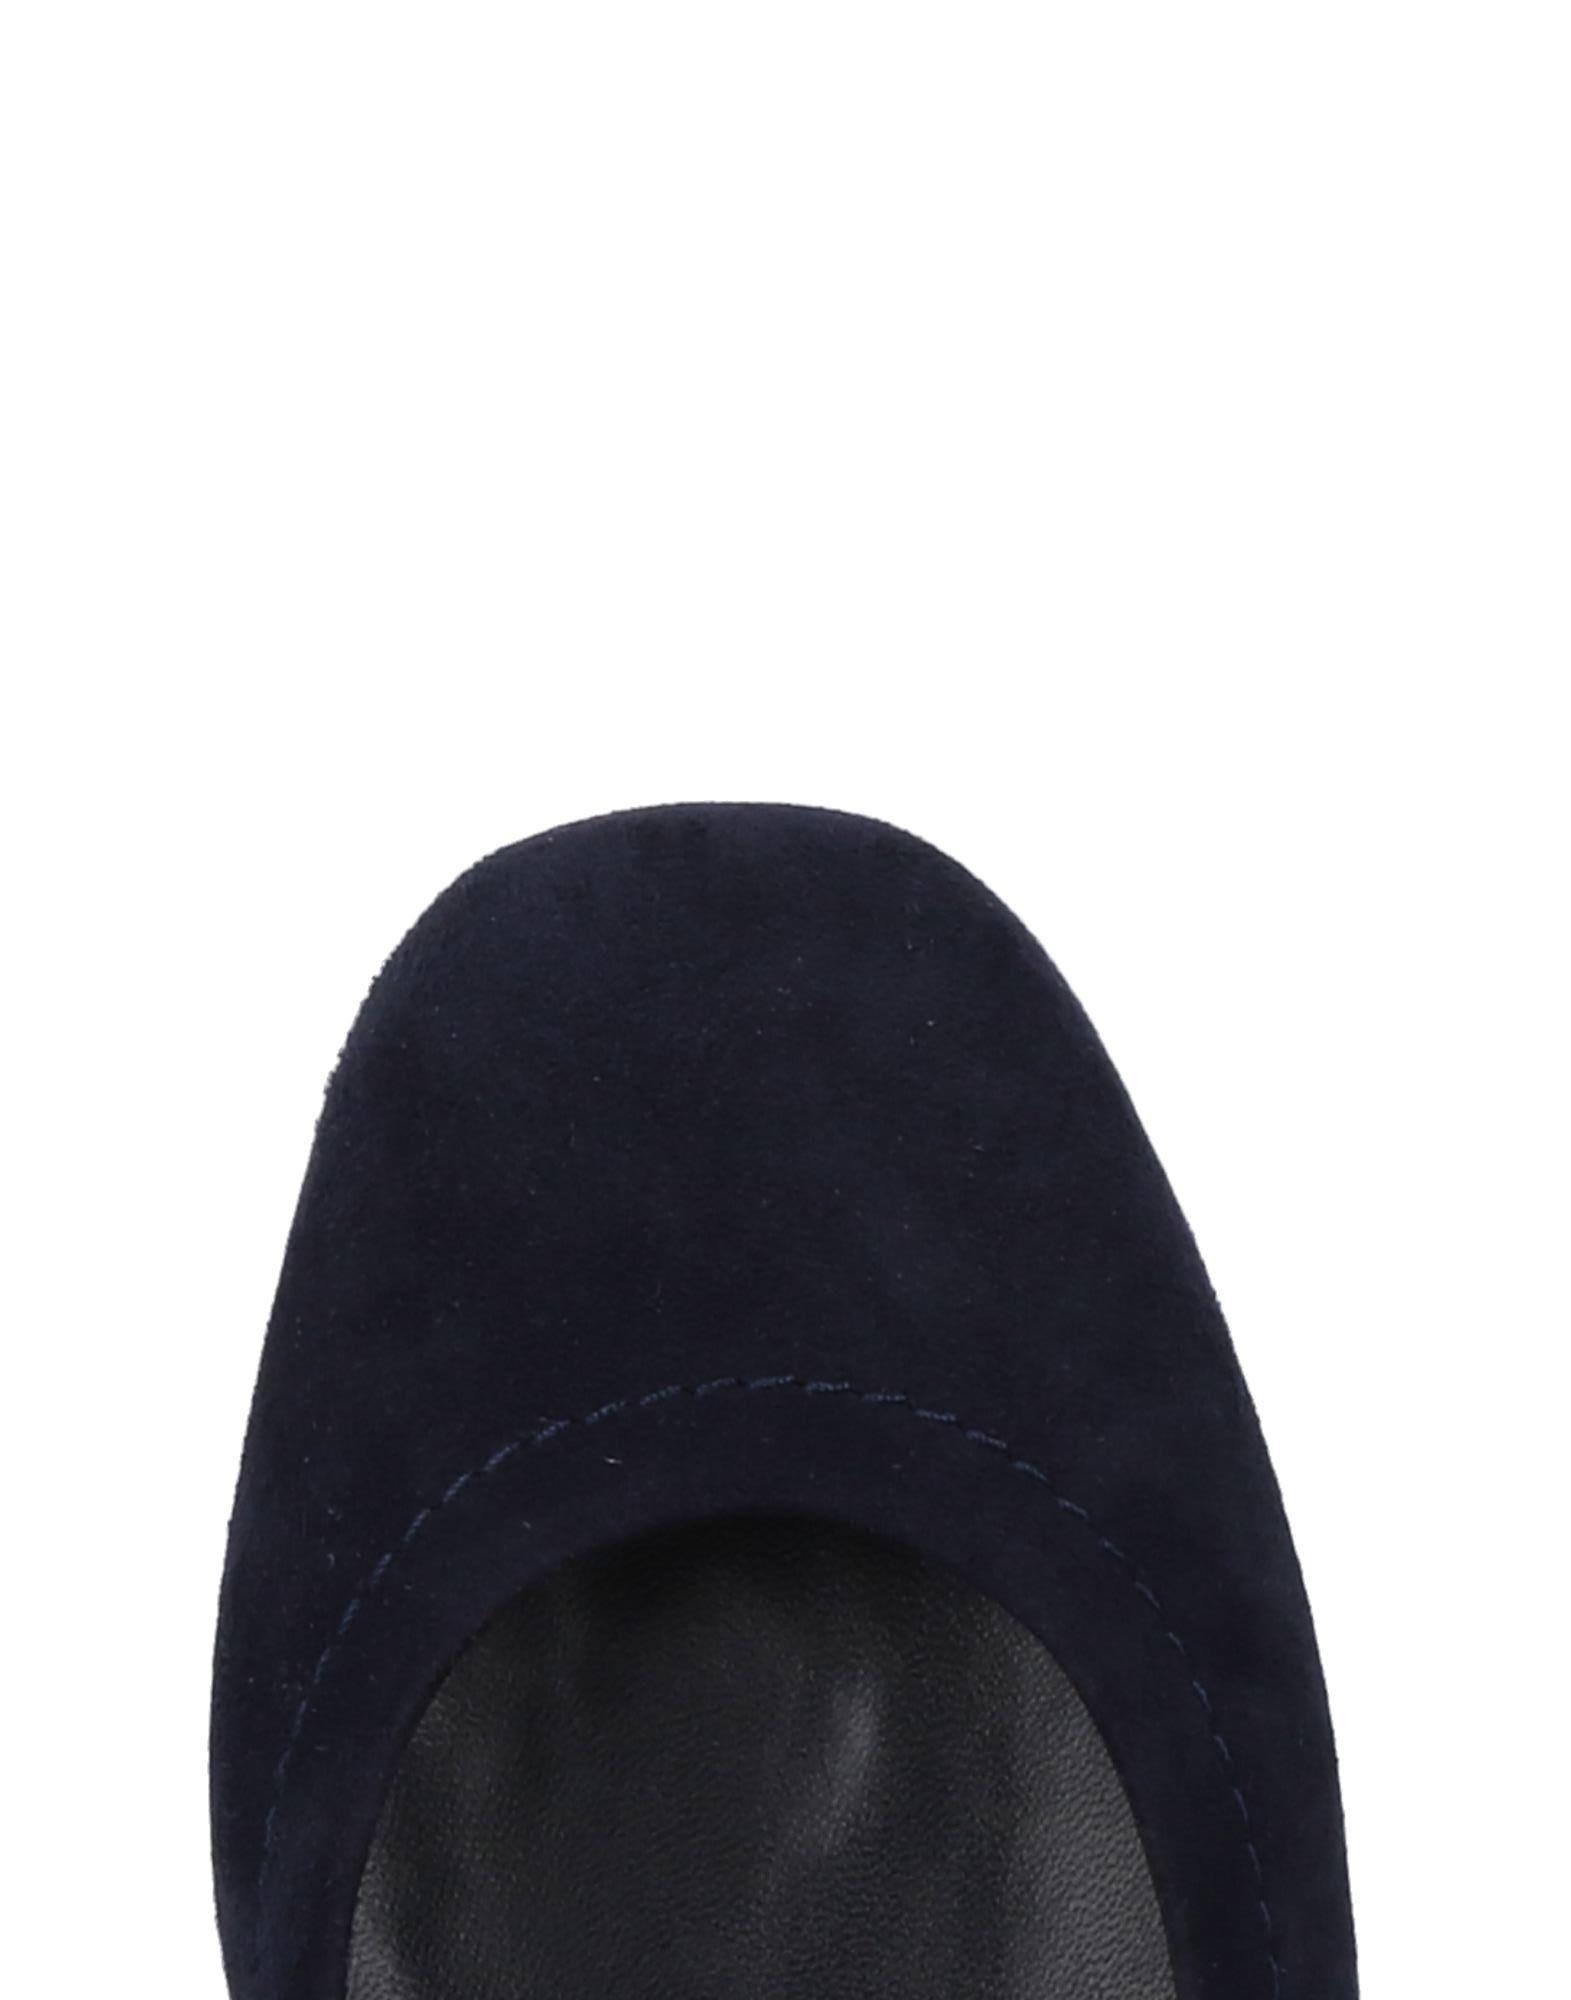 Festa 11521400CF Milano Pumps Damen  11521400CF Festa Gute Qualität beliebte Schuhe 412496